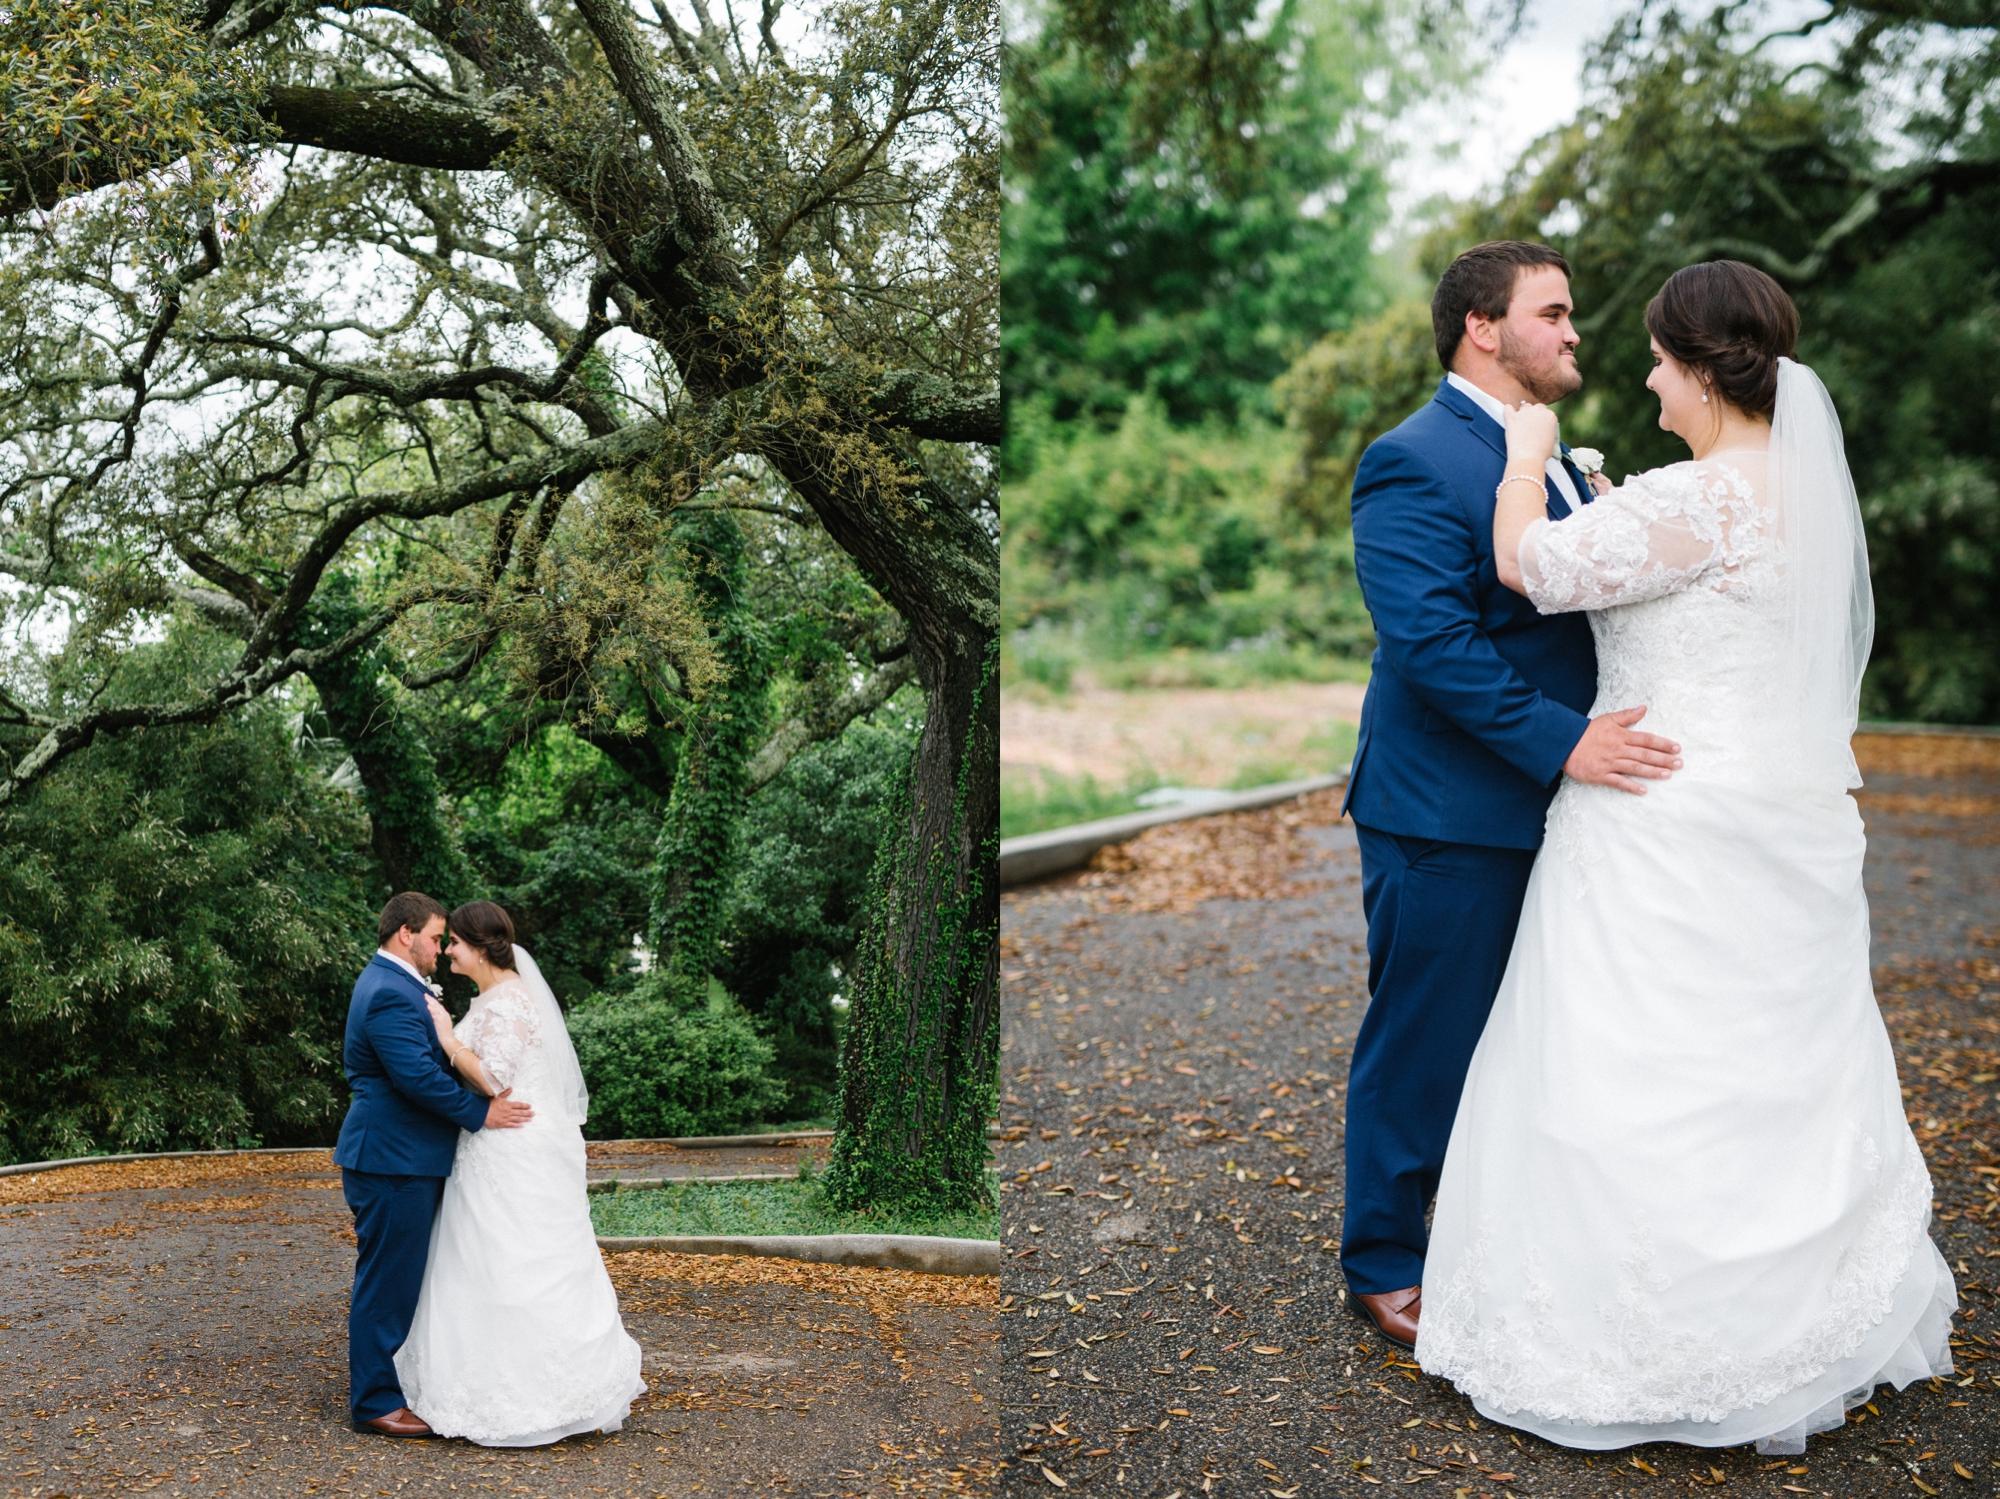 New_Orleans_Wedding_Photographer_0402.jpg